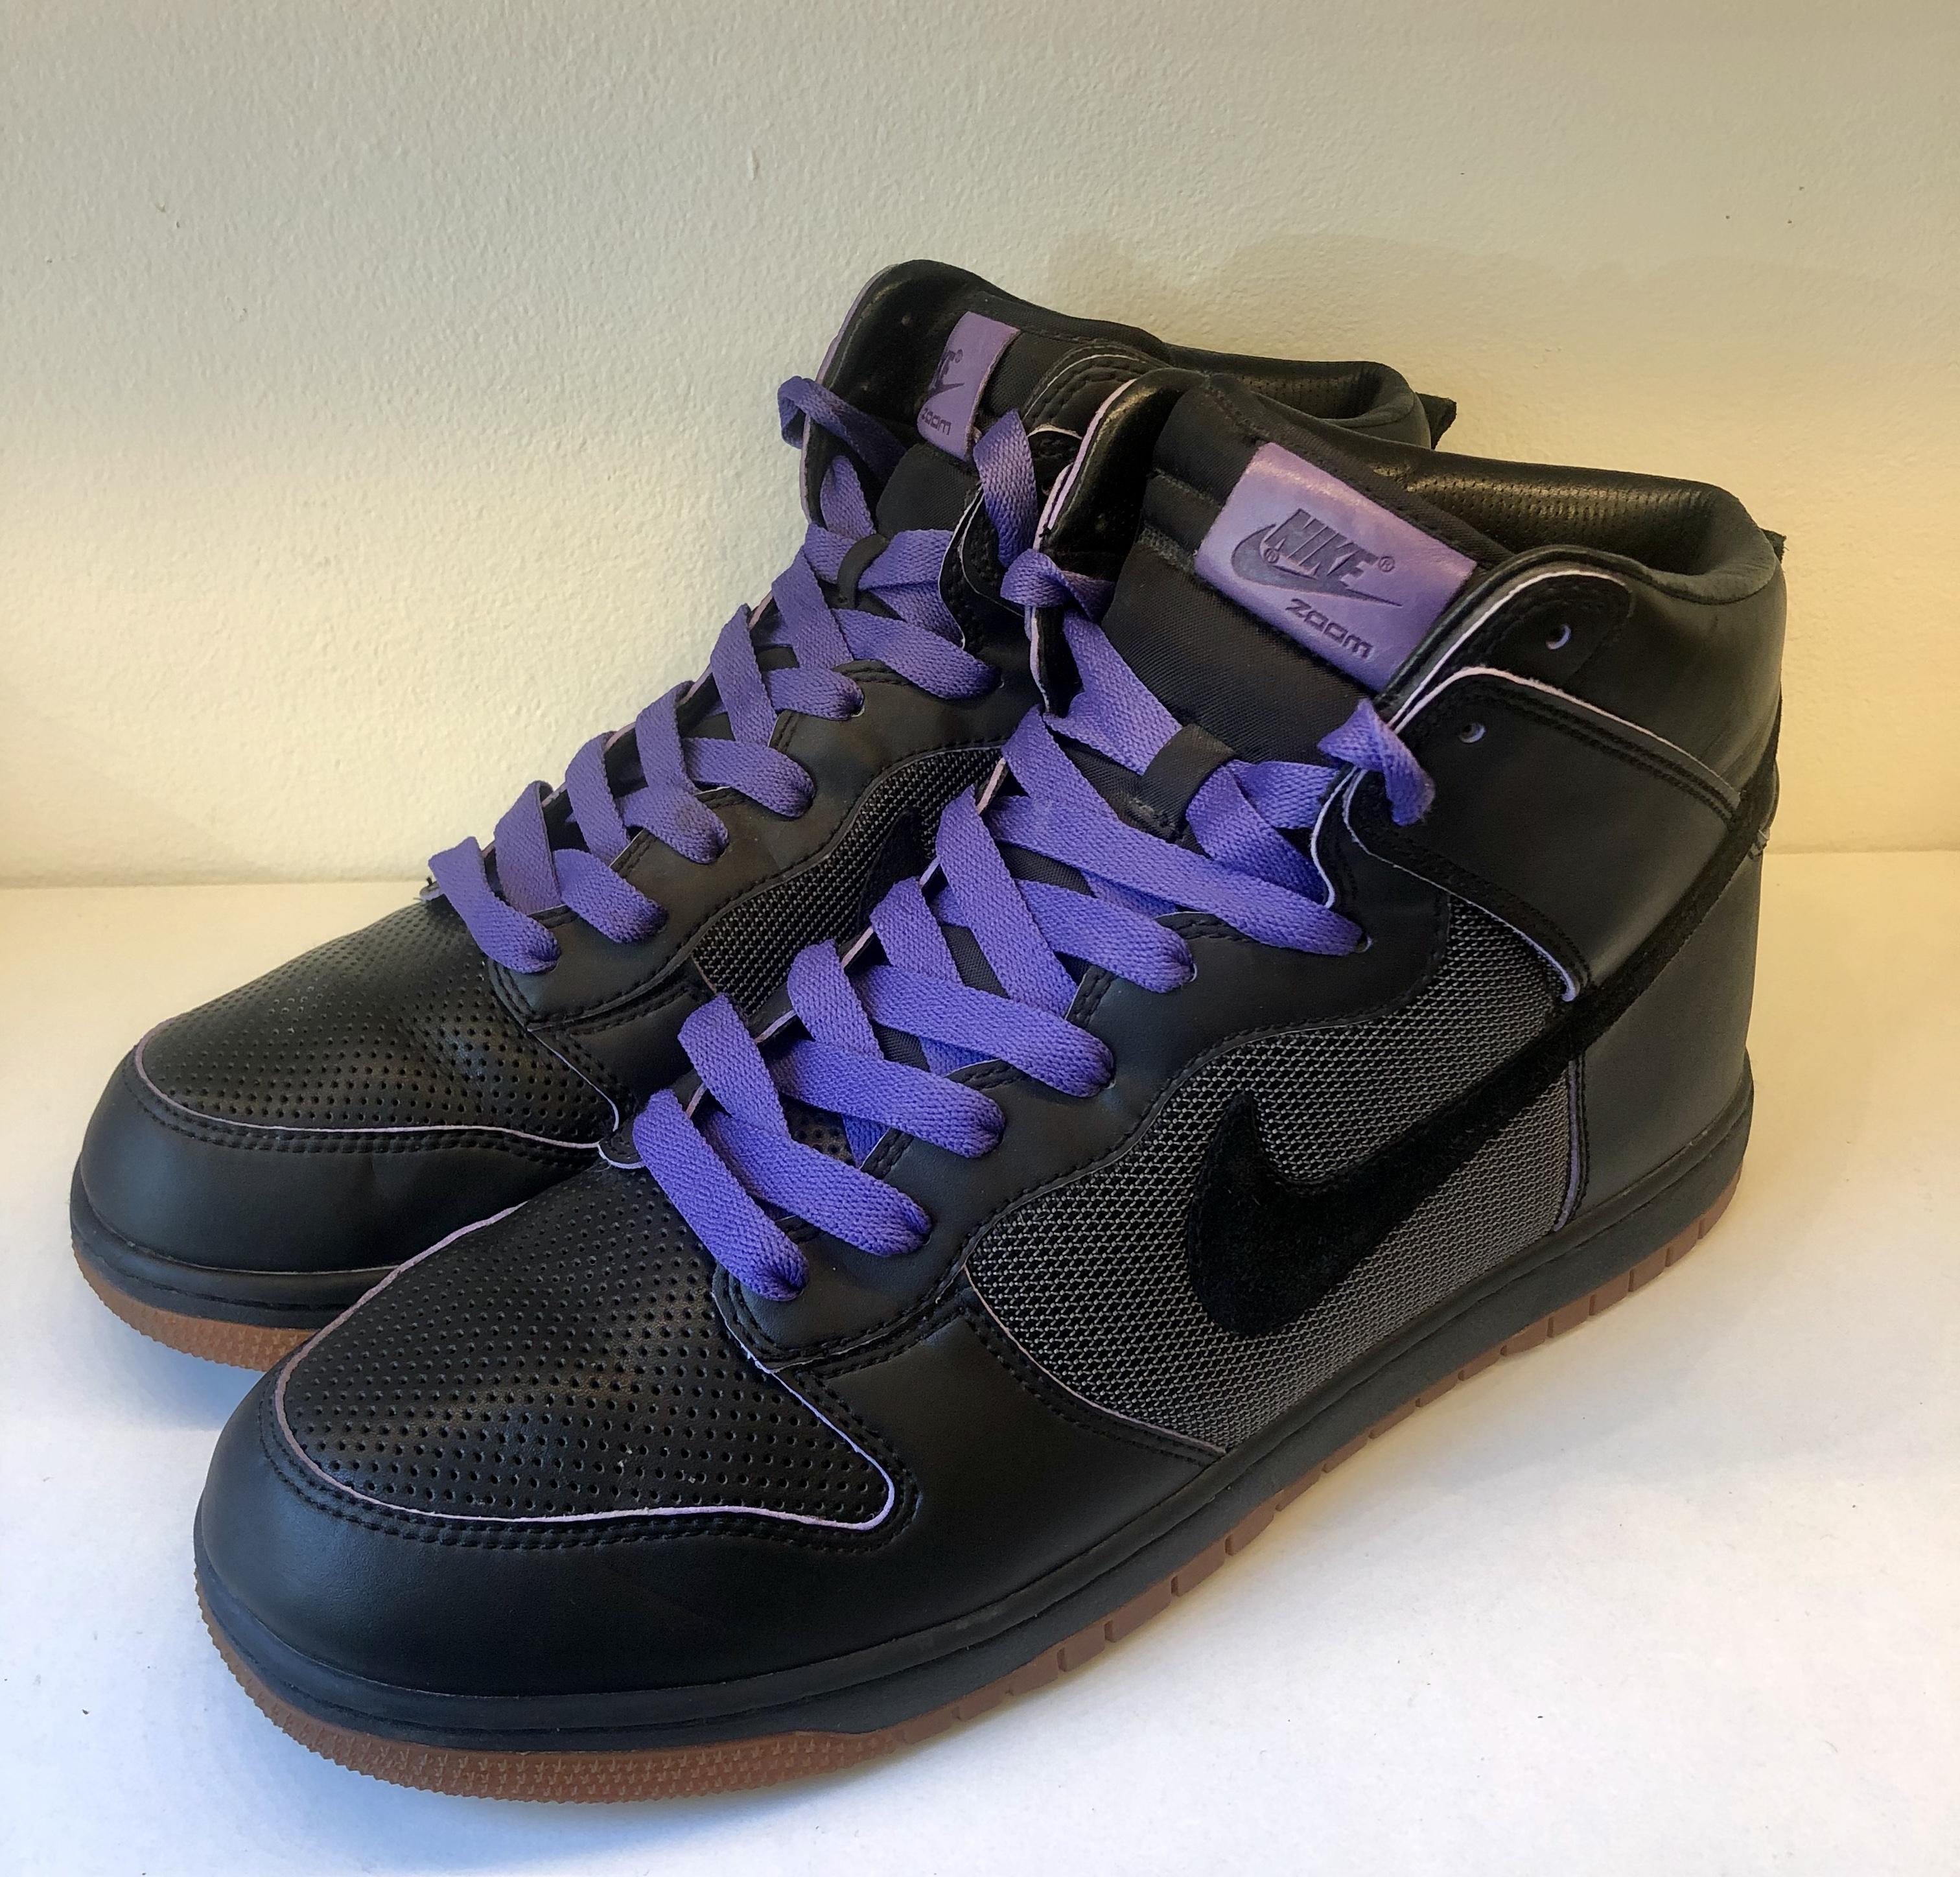 Nike Dunk High Be True To Your City Hong Kong